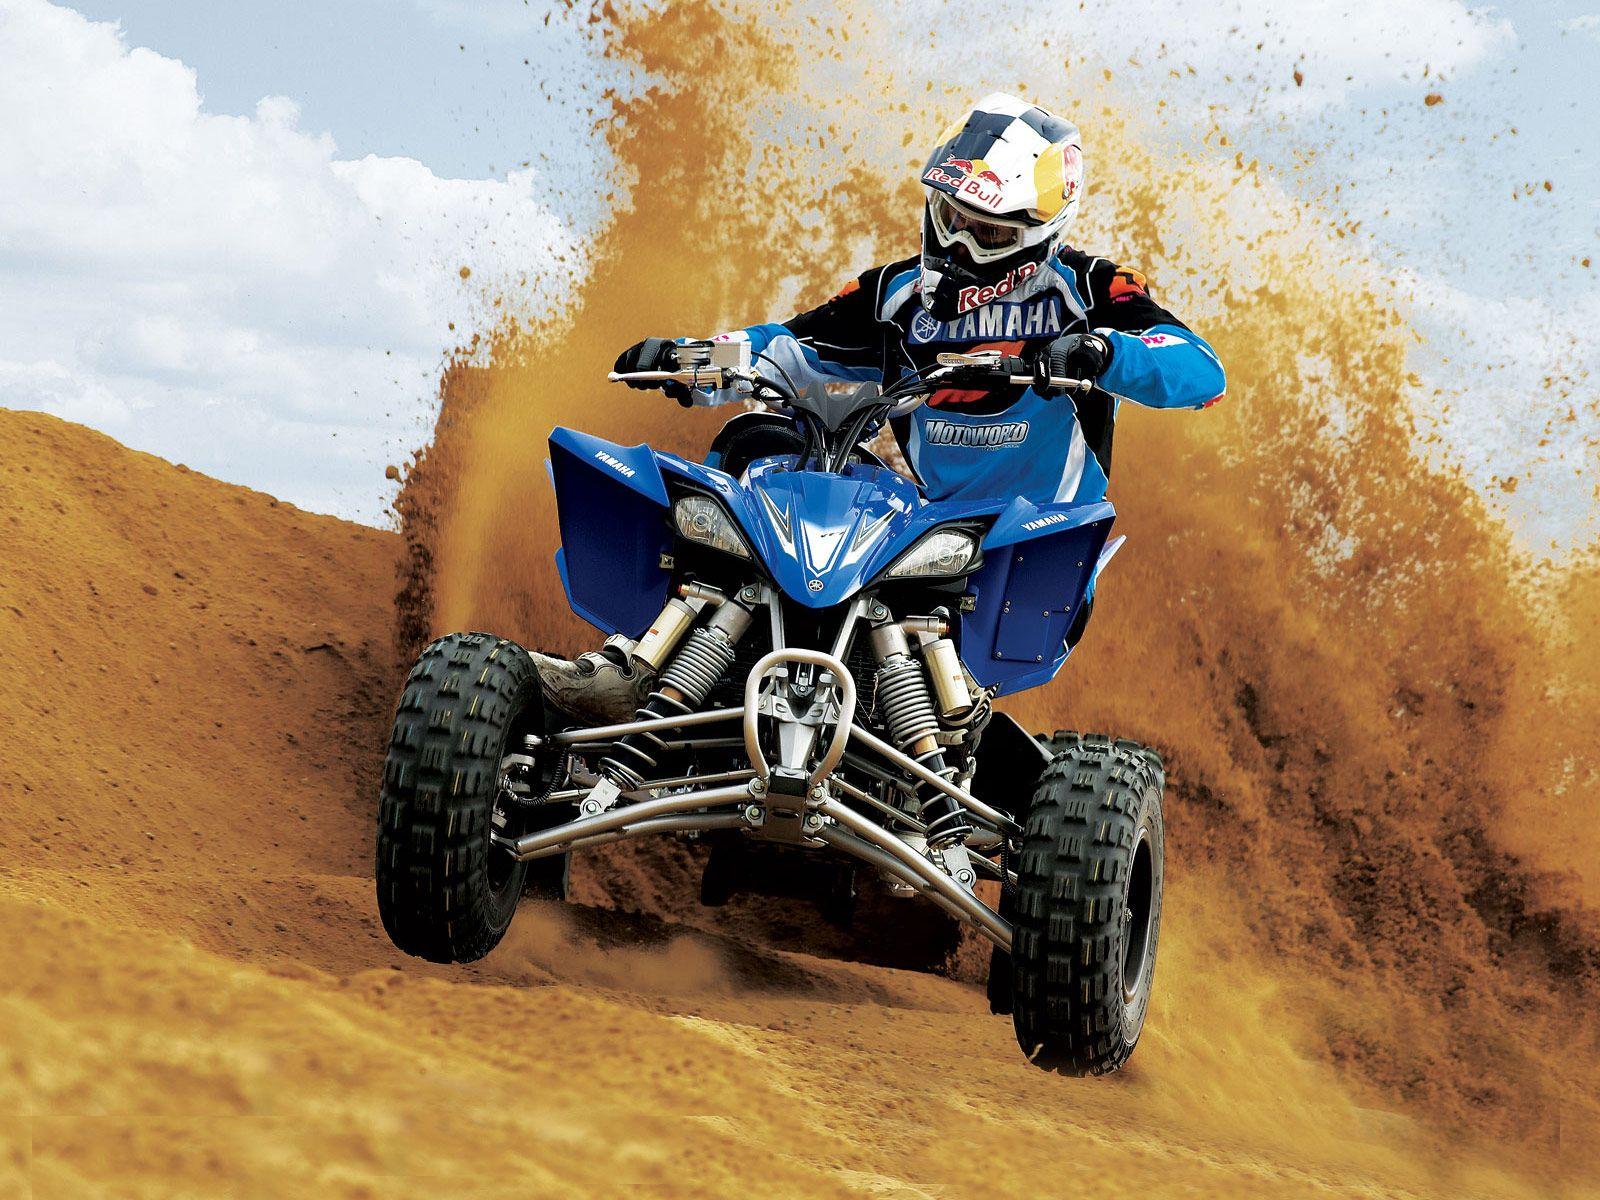 I Enjoy Riding Atv S In When I Have The Free Time Atv Car Atv Motocross Yamaha Atv